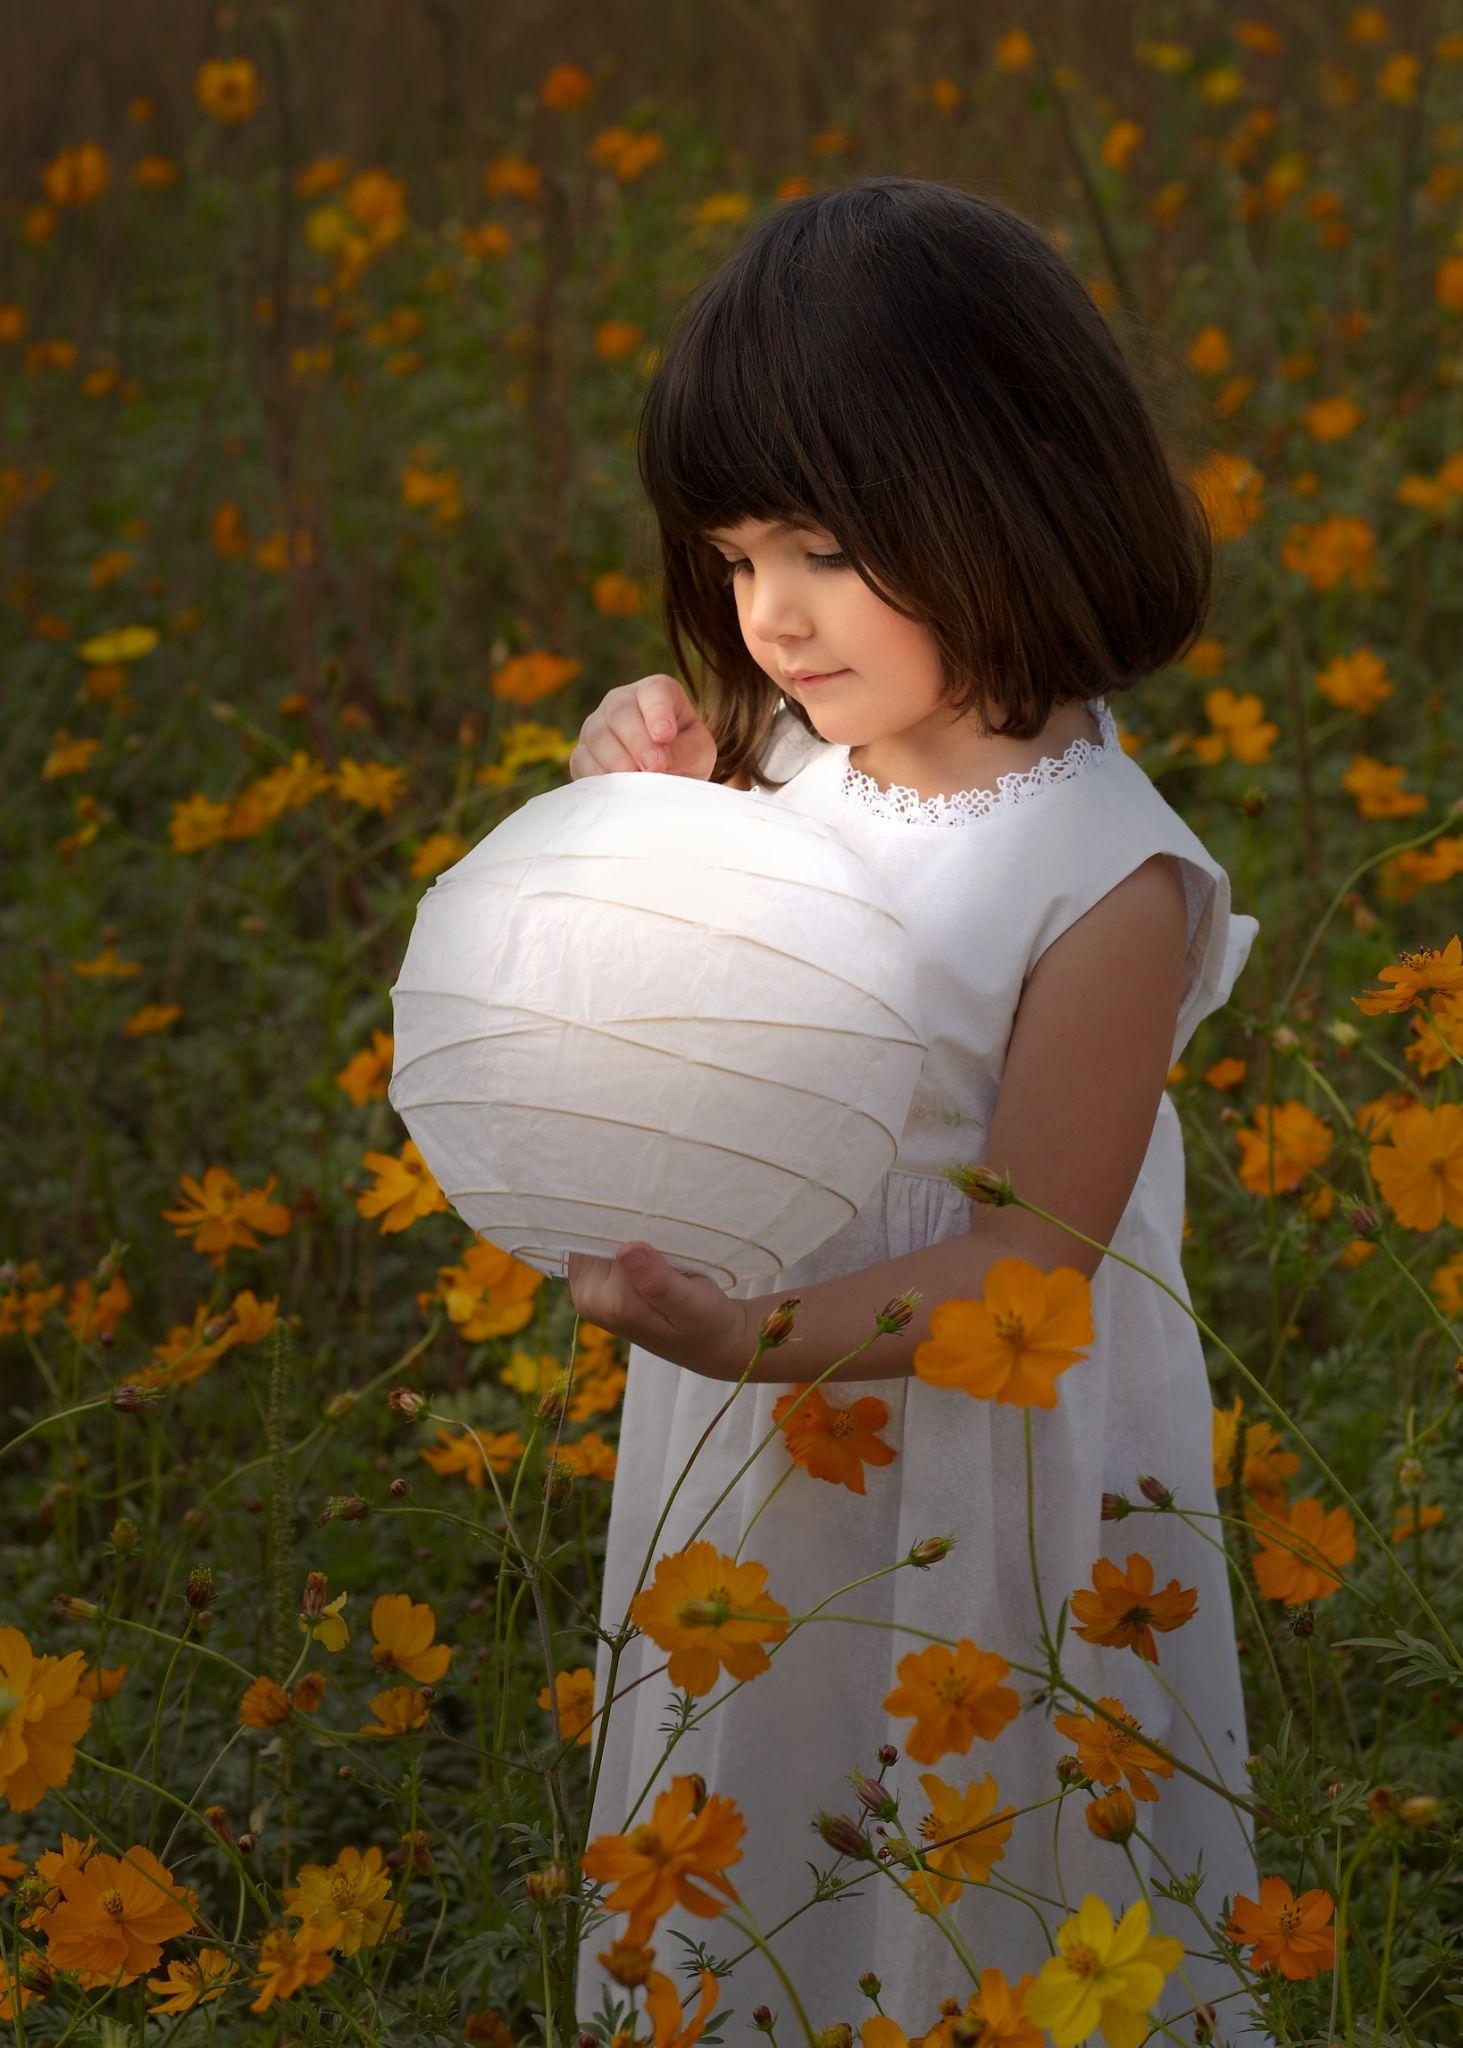 Cynthia Pace Photography -  South Carolina Premier Children & Family Portrait Artist